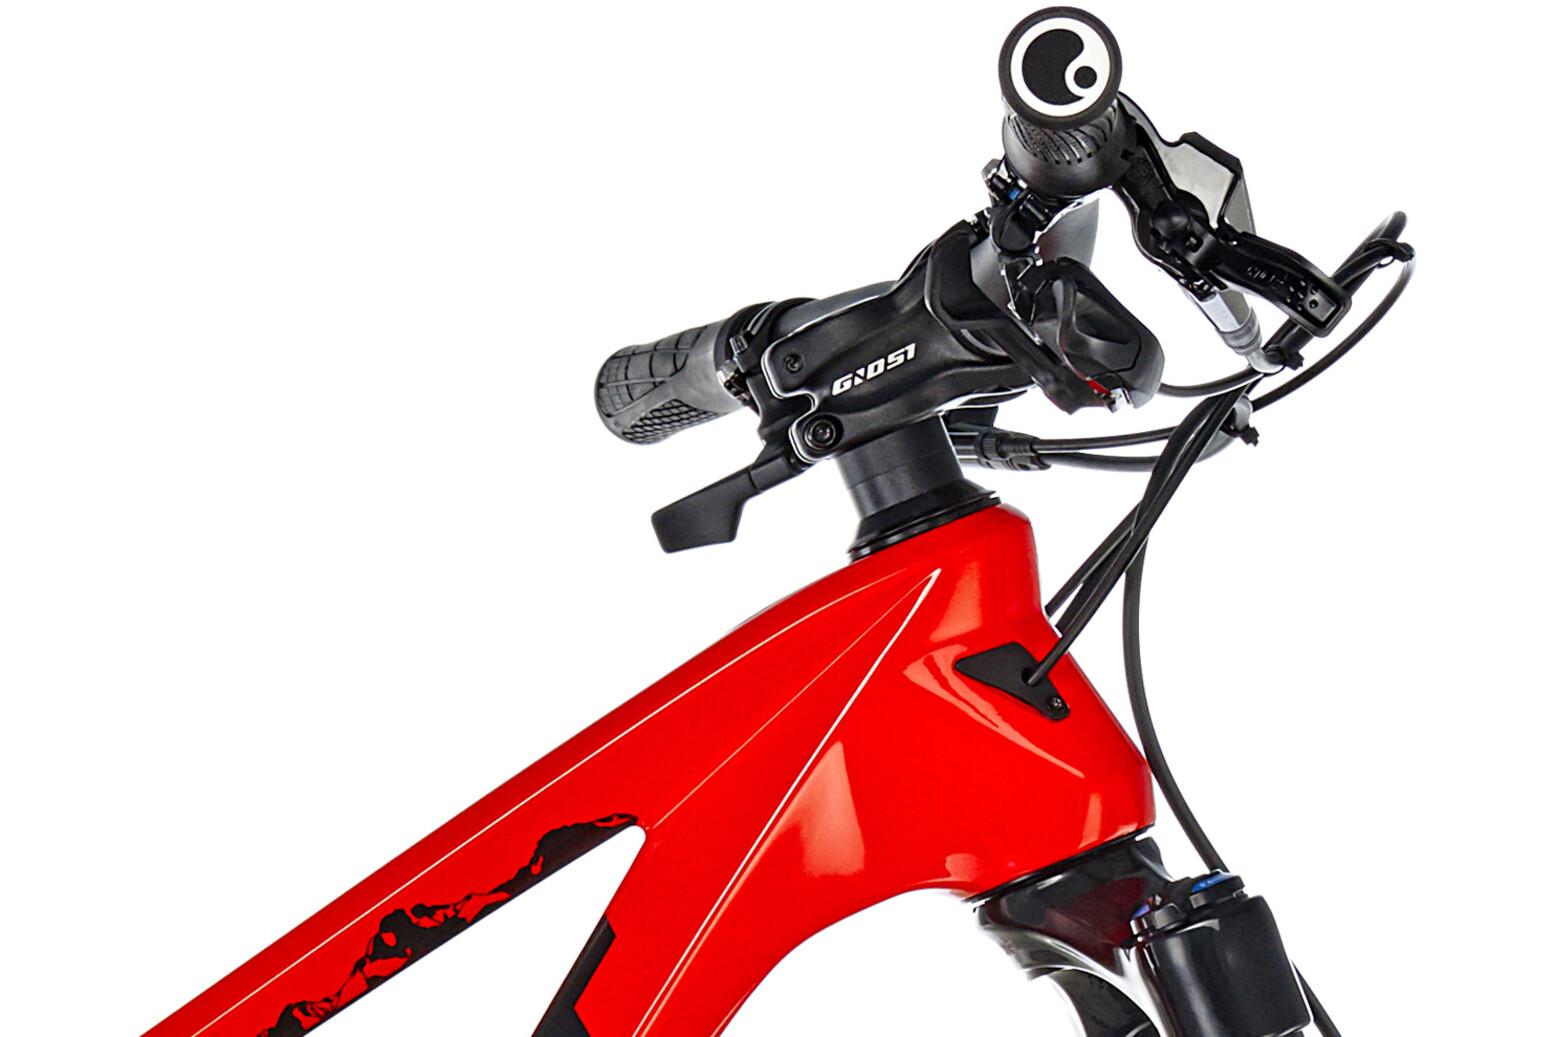 ghost sl amr 6 9 lc 29 mtb full suspension red at bikester. Black Bedroom Furniture Sets. Home Design Ideas